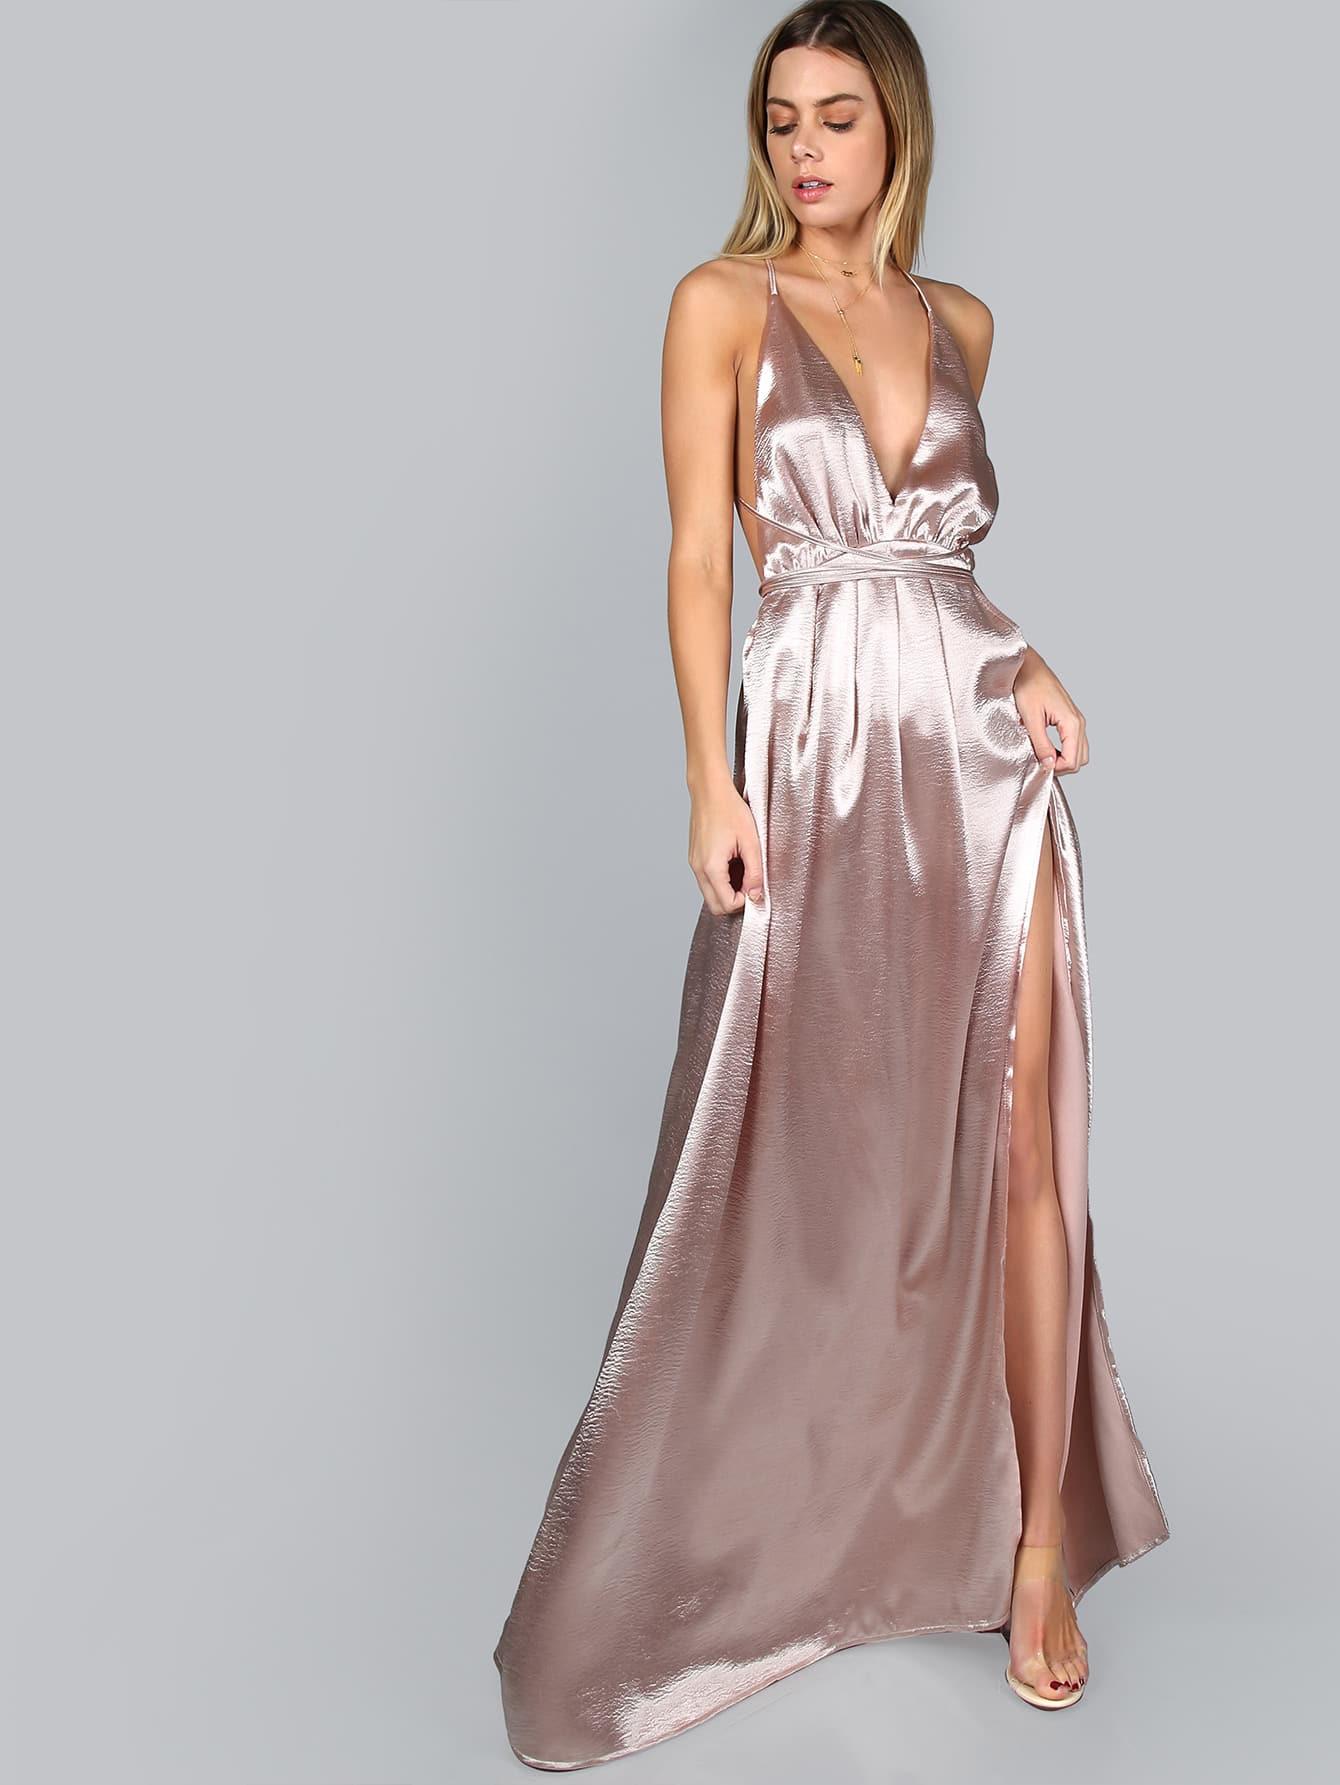 Plunge Neck Crisscross Back High Slit Wrap Cami Dress -SheIn(Sheinside)